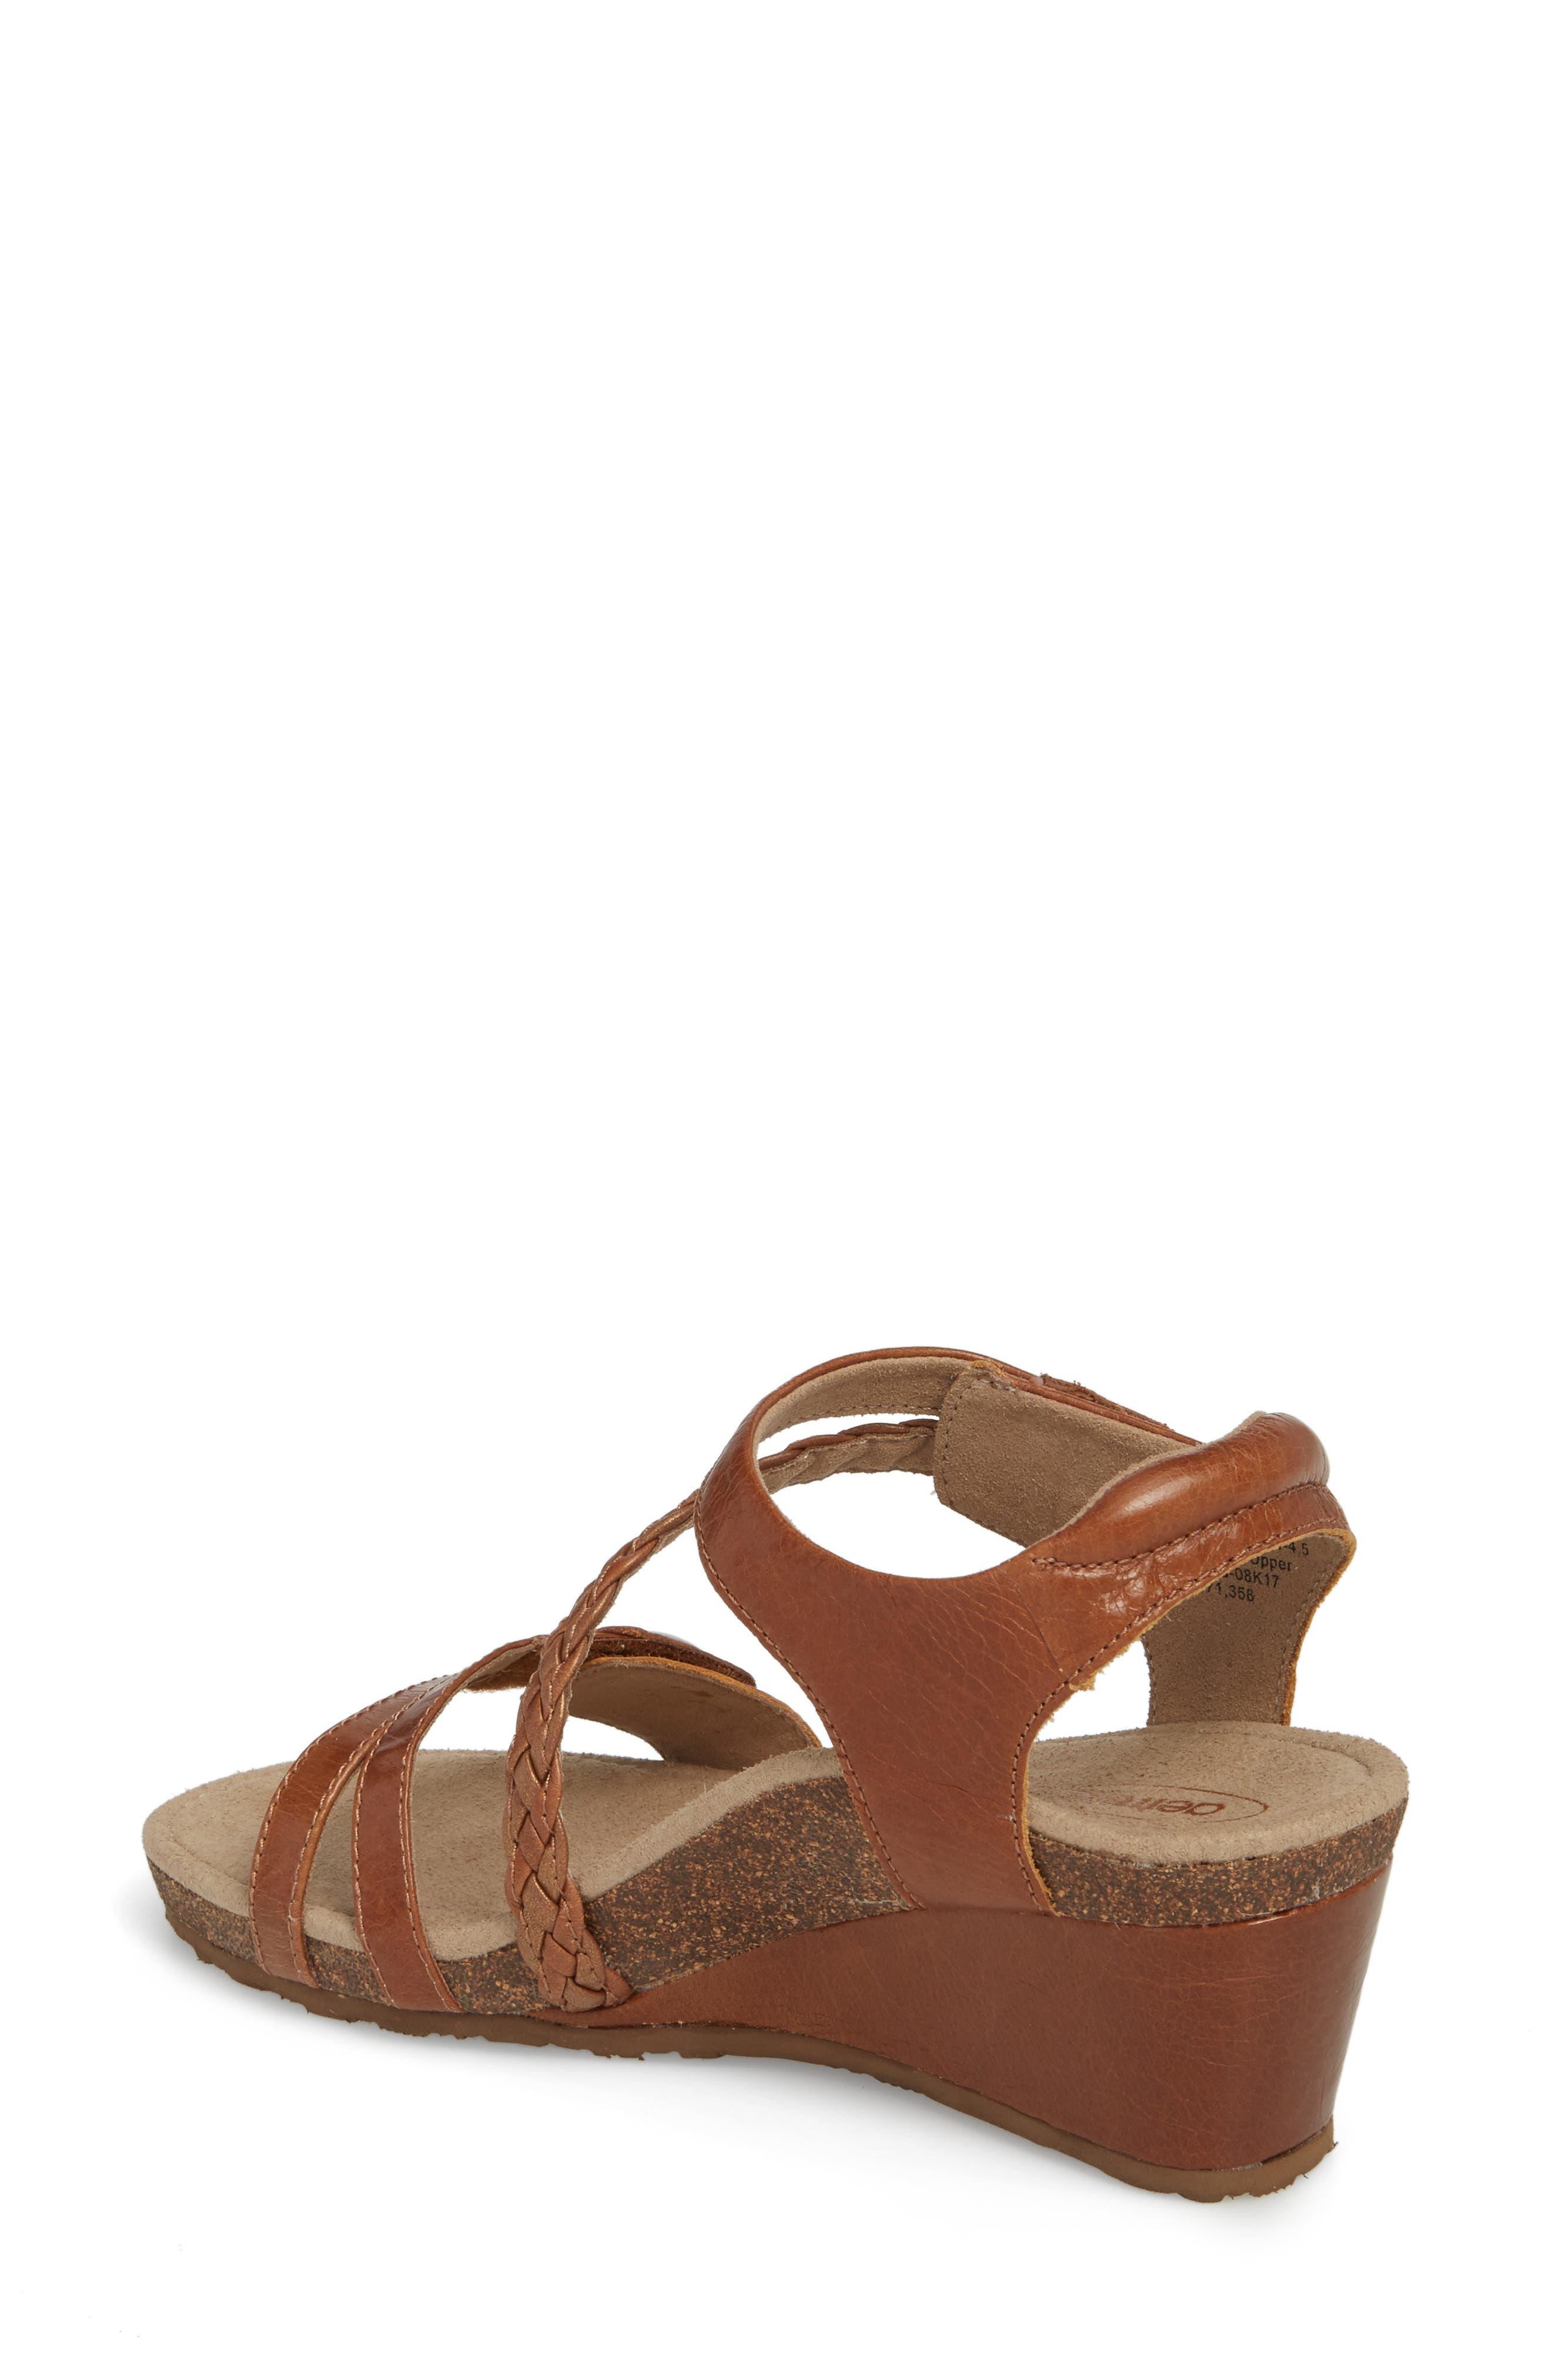 'Naya' Wedge Sandal,                             Alternate thumbnail 2, color,                             Cognac Leather